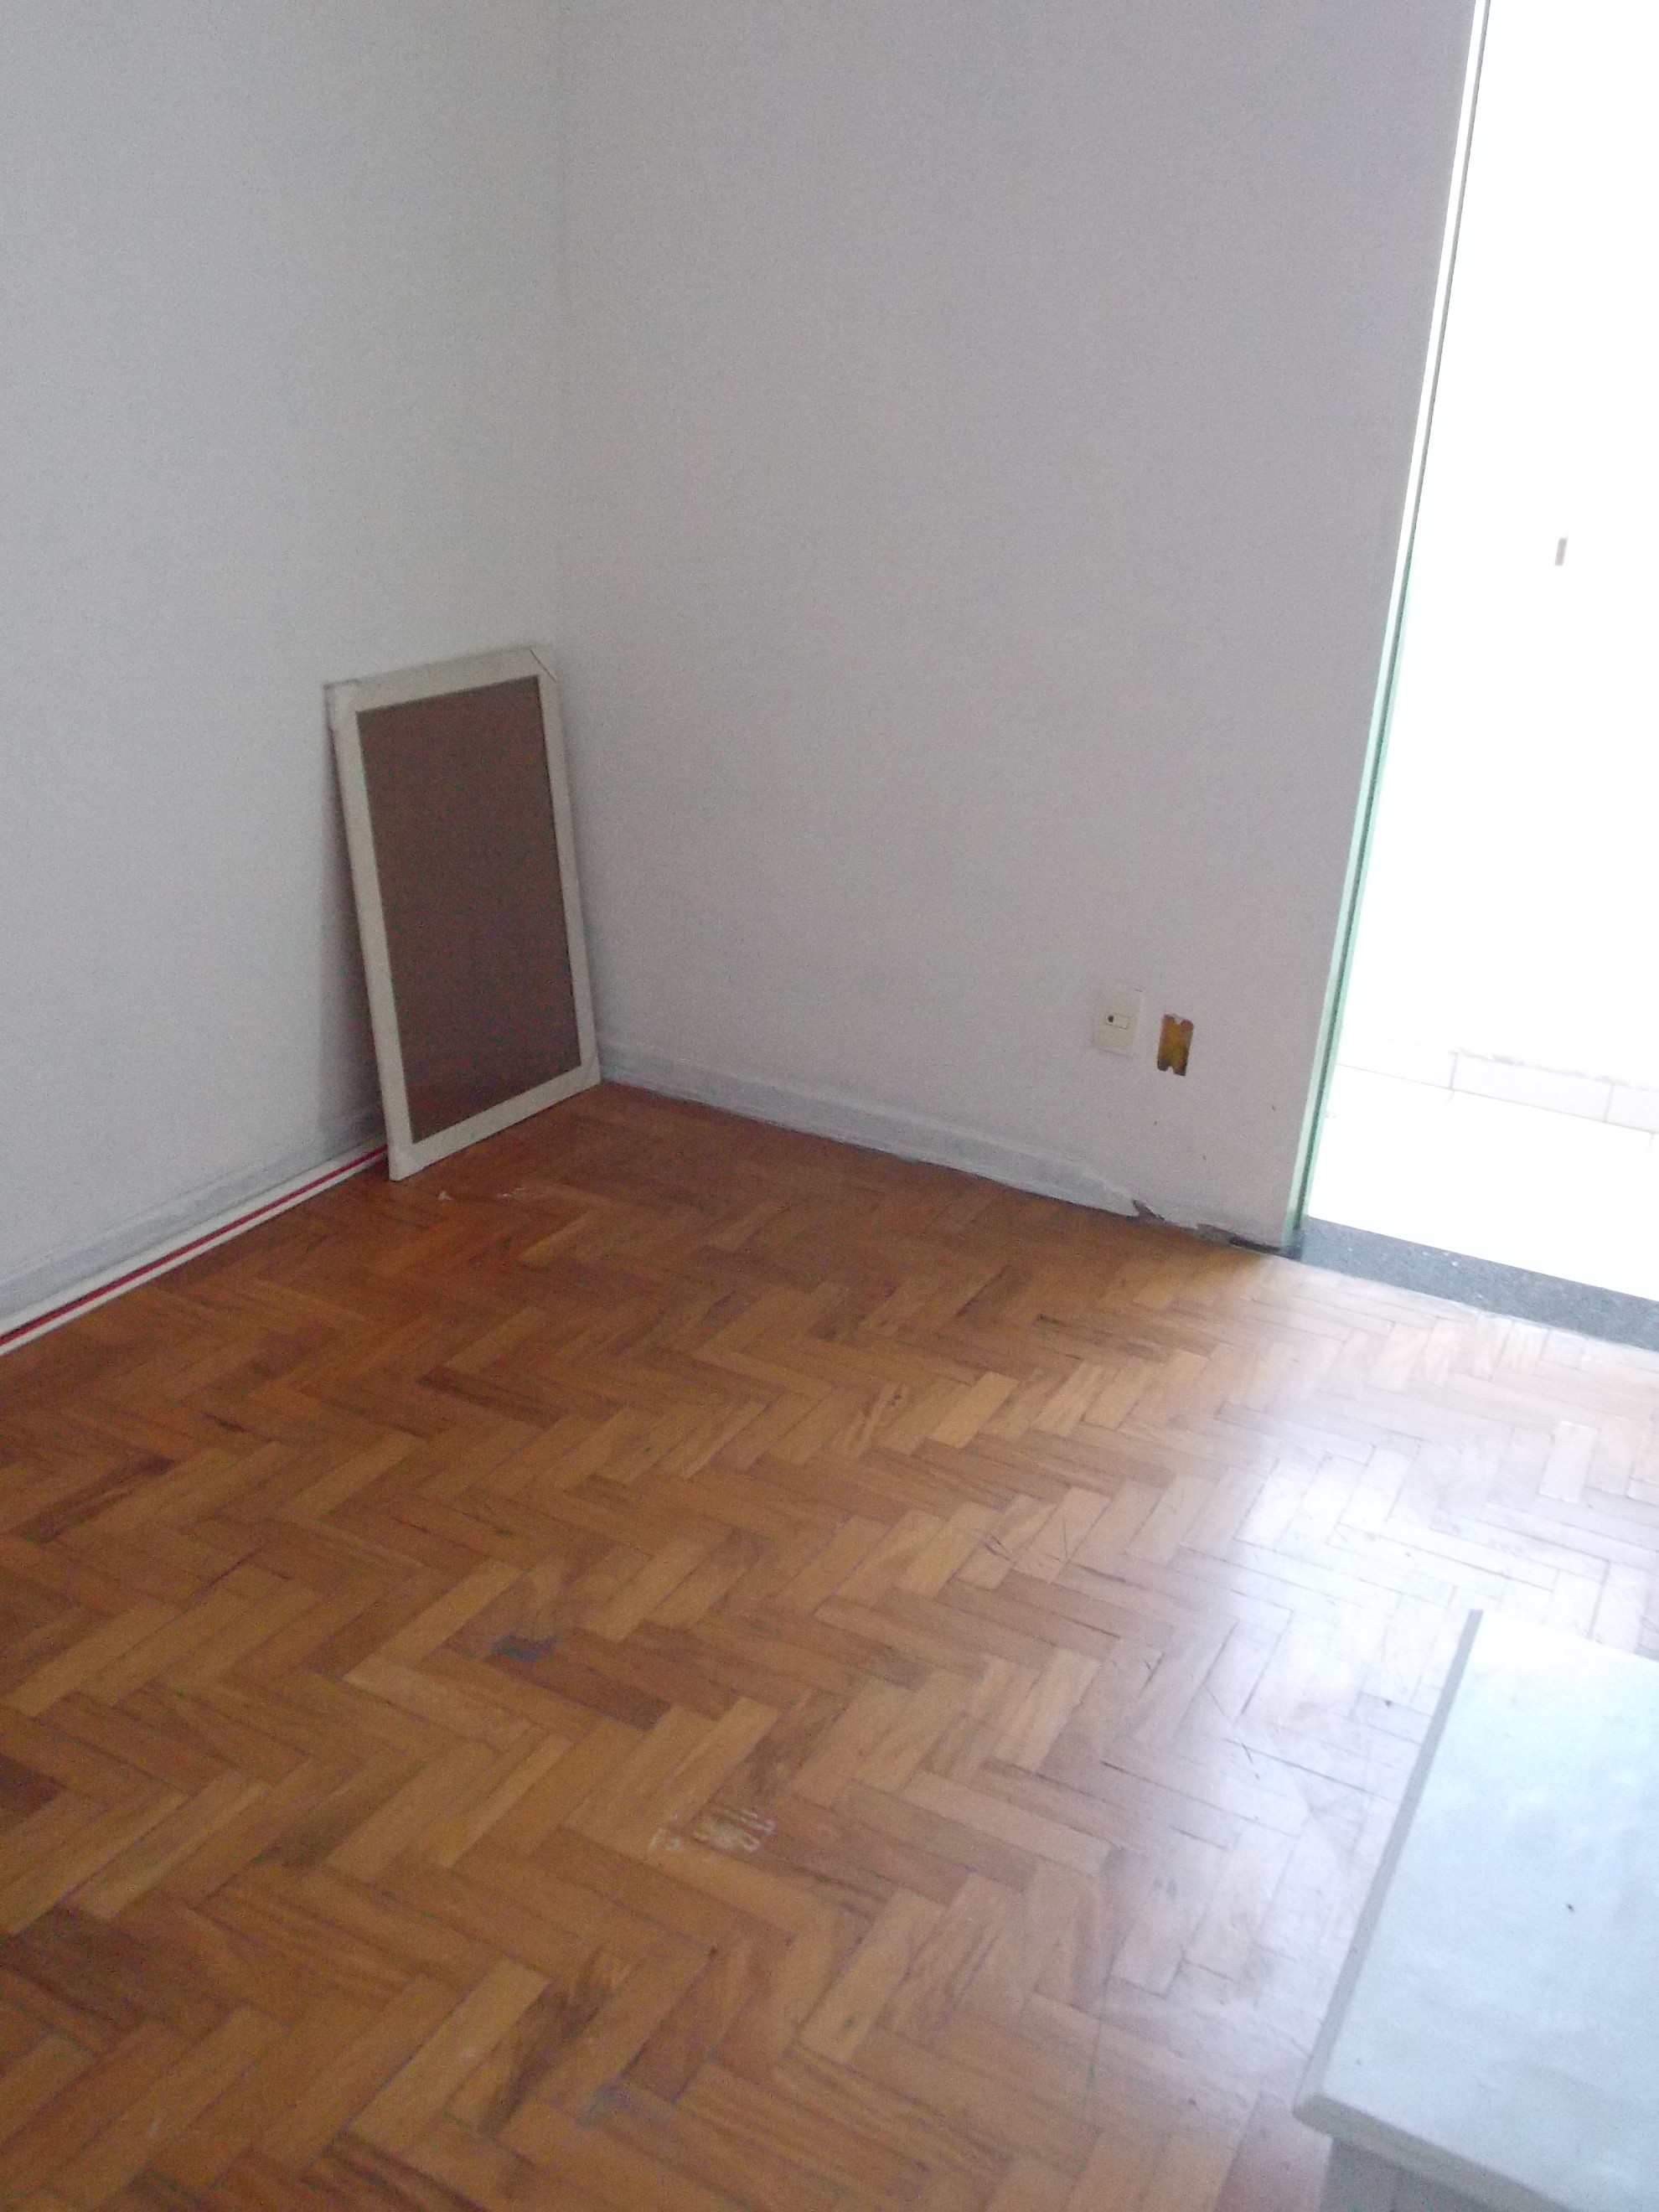 D - Dormitorio (3)